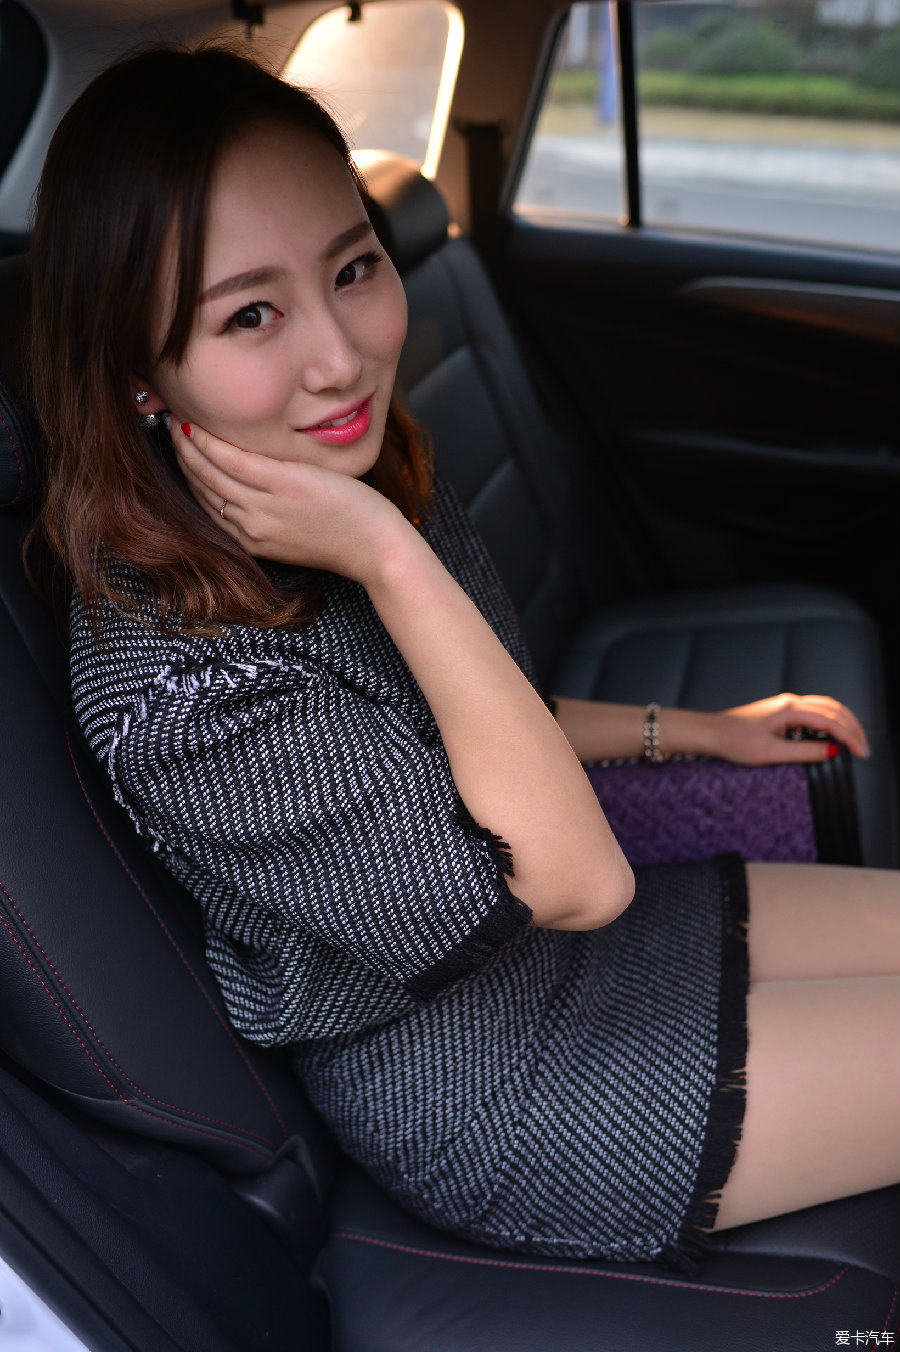 cs75美女车模图片图片